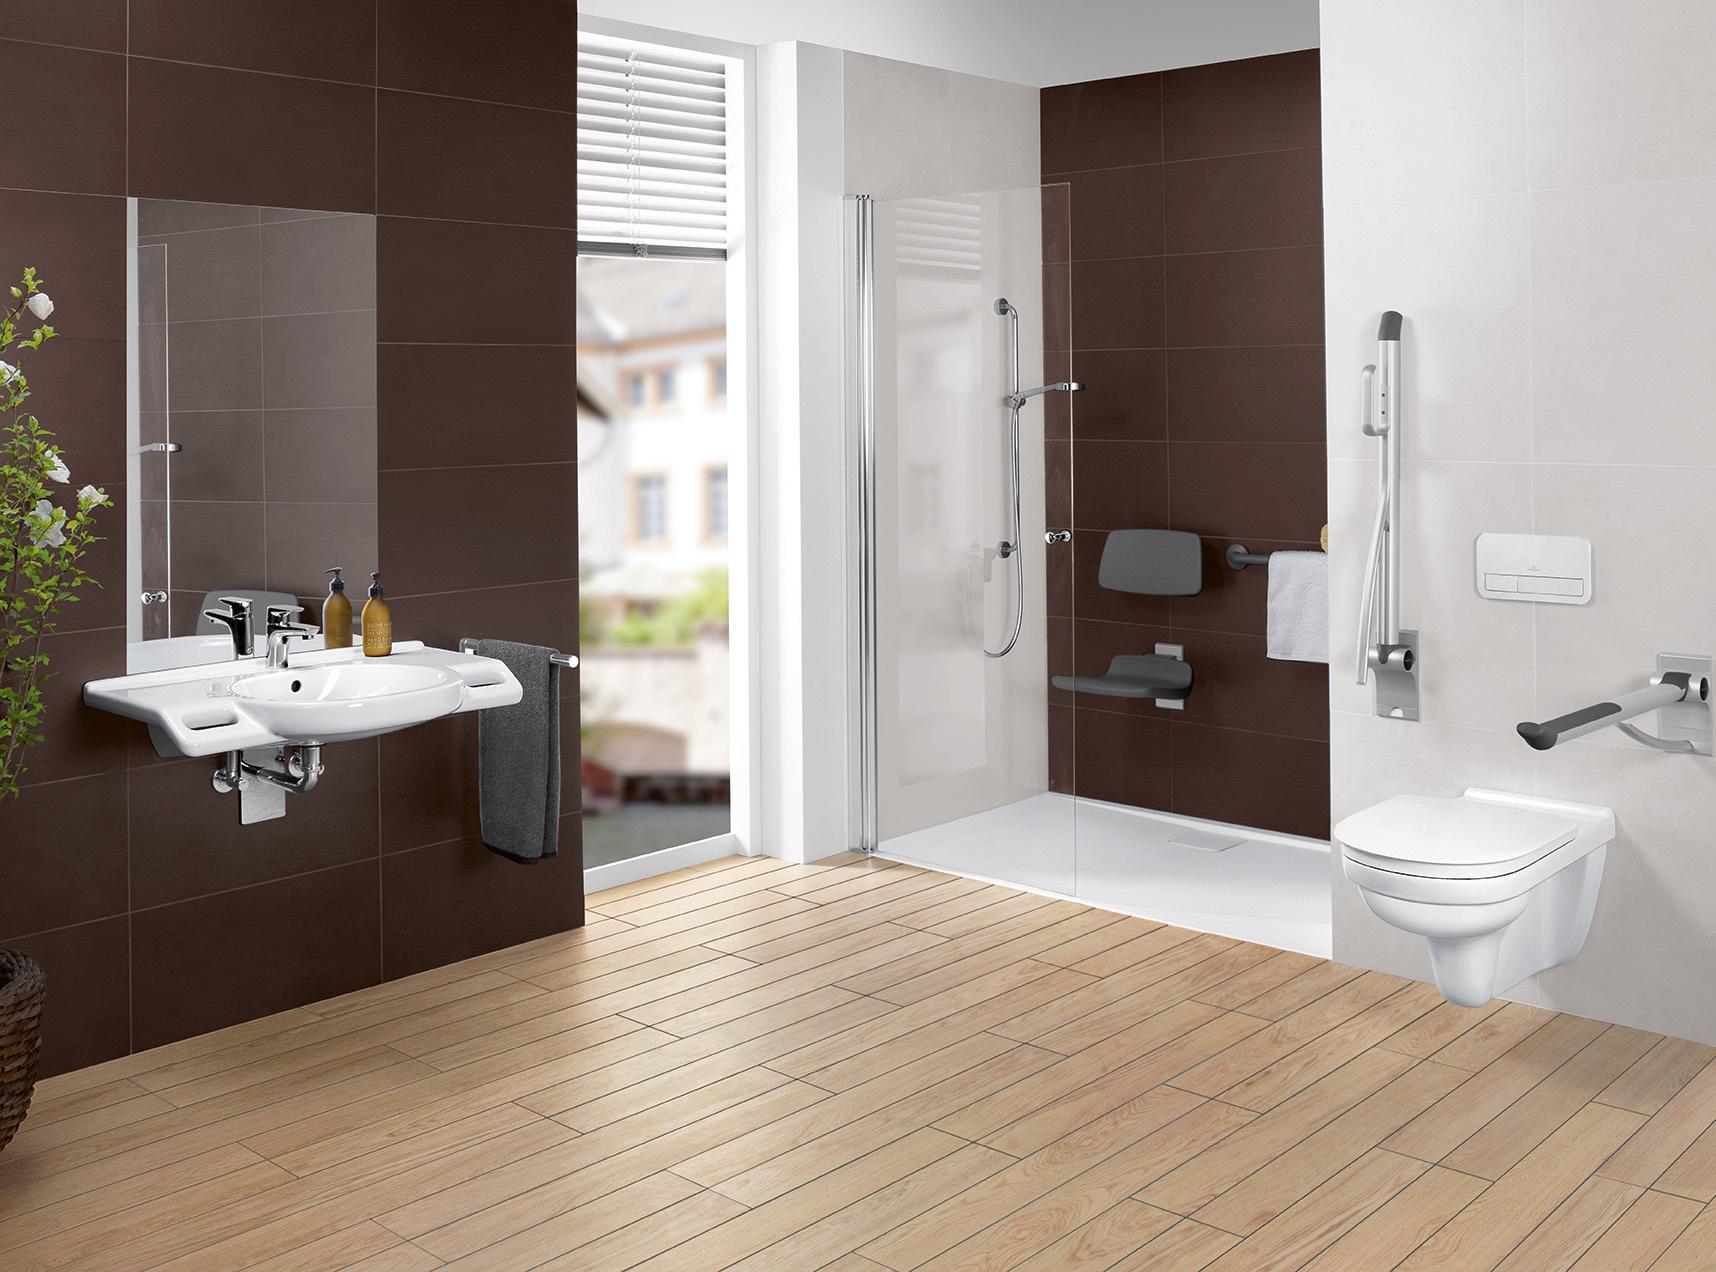 Salle De Bain Accessible ~ receveur de douche accessible pour salle de bains metalrim de